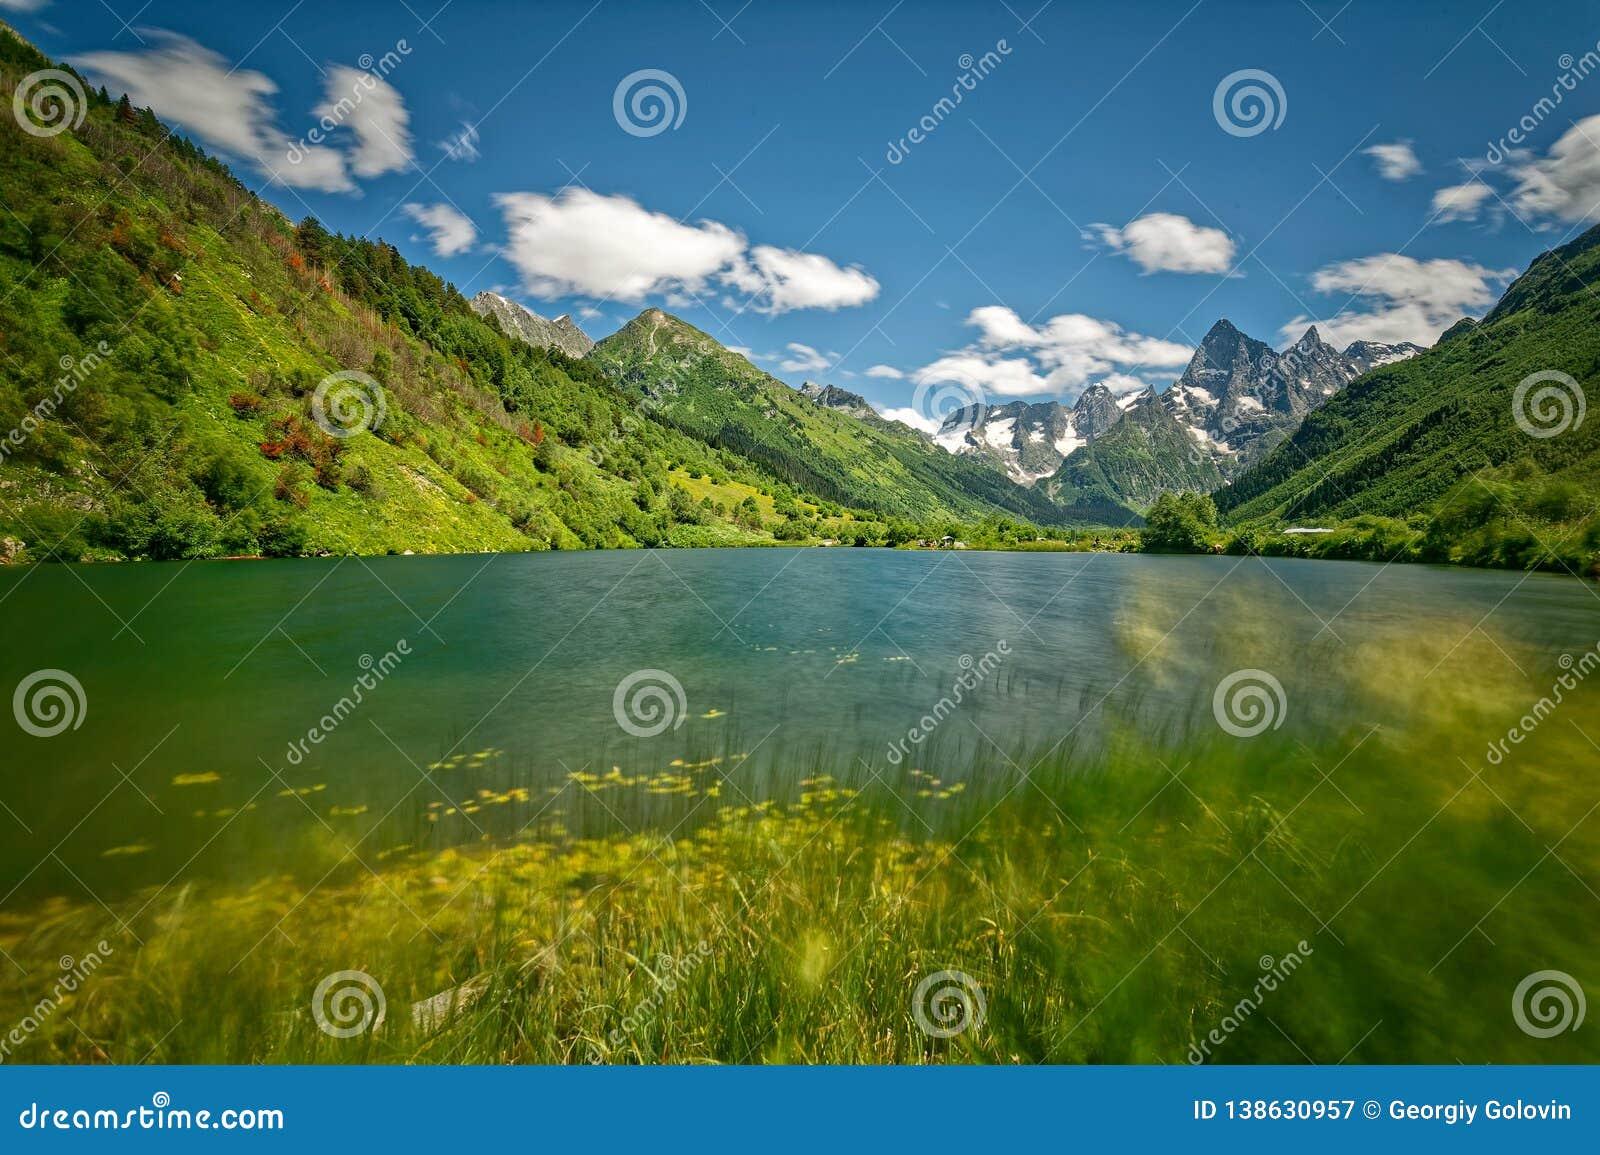 Kaukasus, Karachay-Cherkessiaregion, Teberda-Reserve, See-Tumanly-Gel